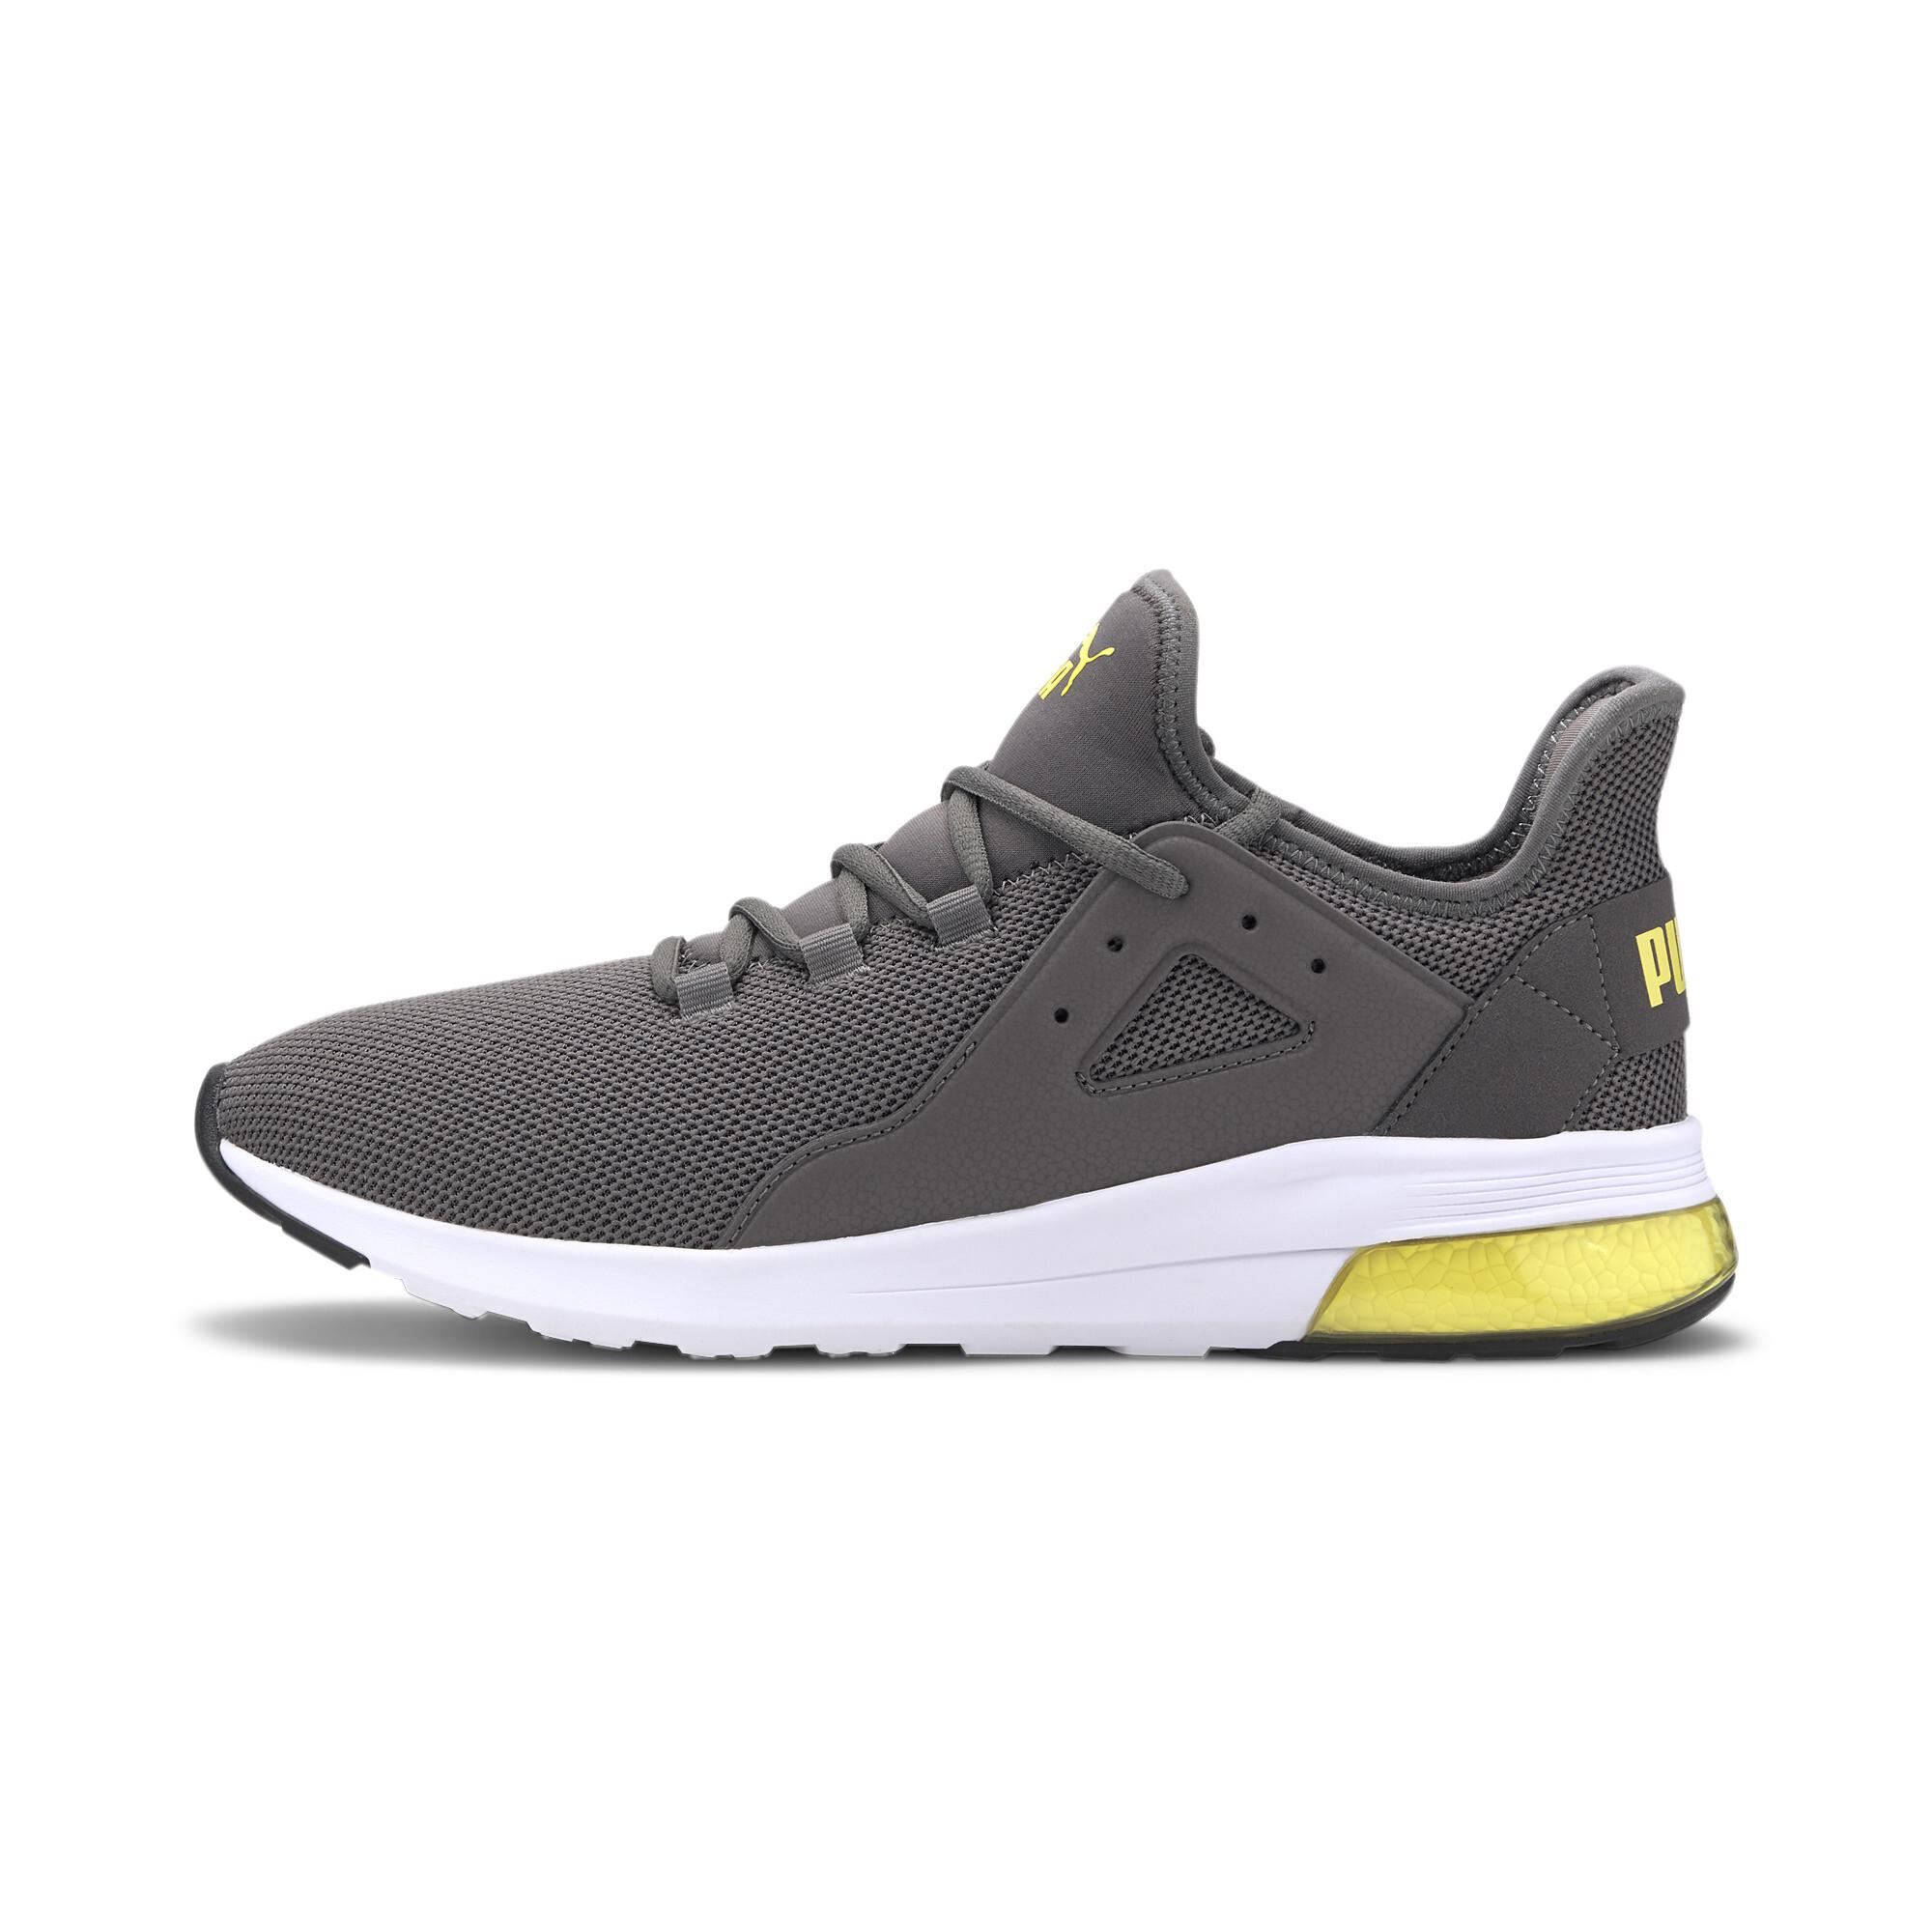 PUMA-Men-039-s-Electron-Street-Sneakers thumbnail 19